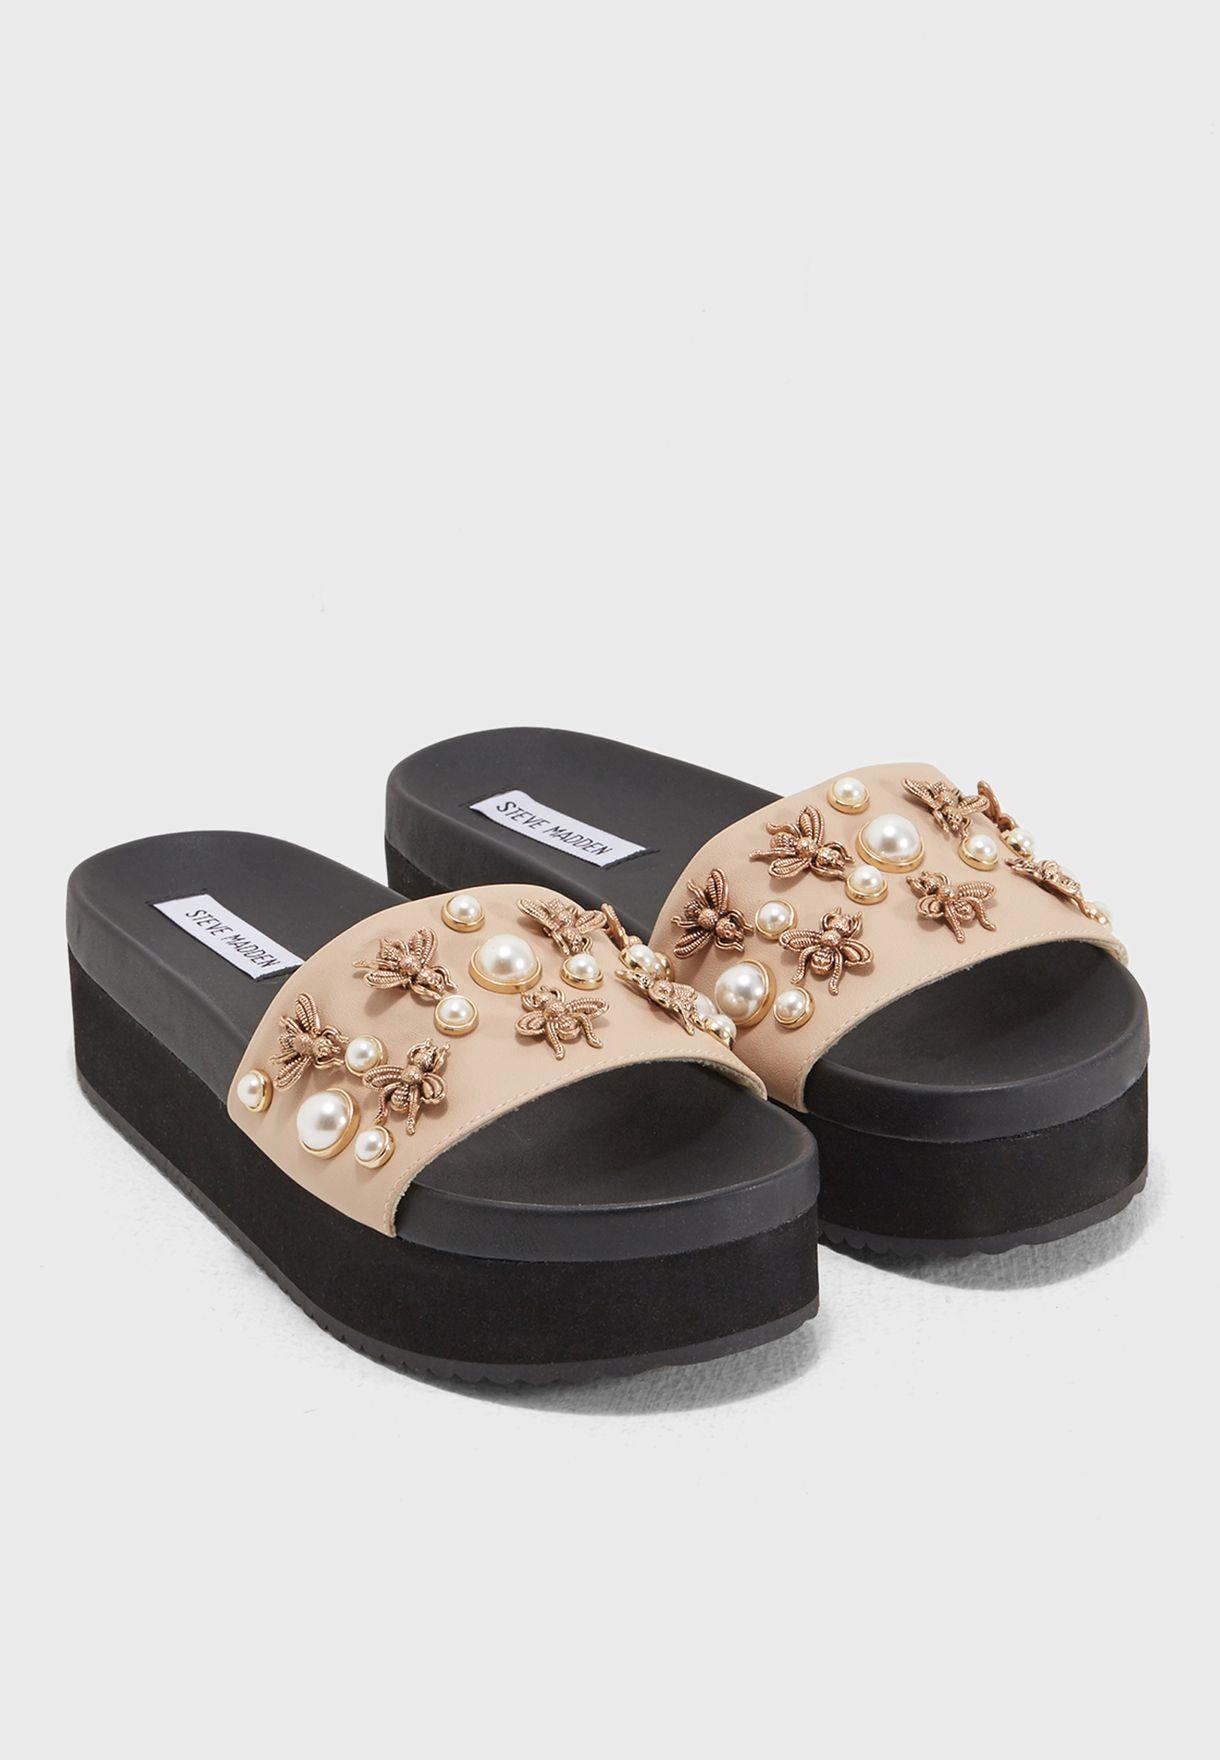 2e830f91393 Shop Steve Madden beige Adorn Flat Sandals ADORN for Women in Bahrain -  ST977SH49OOC